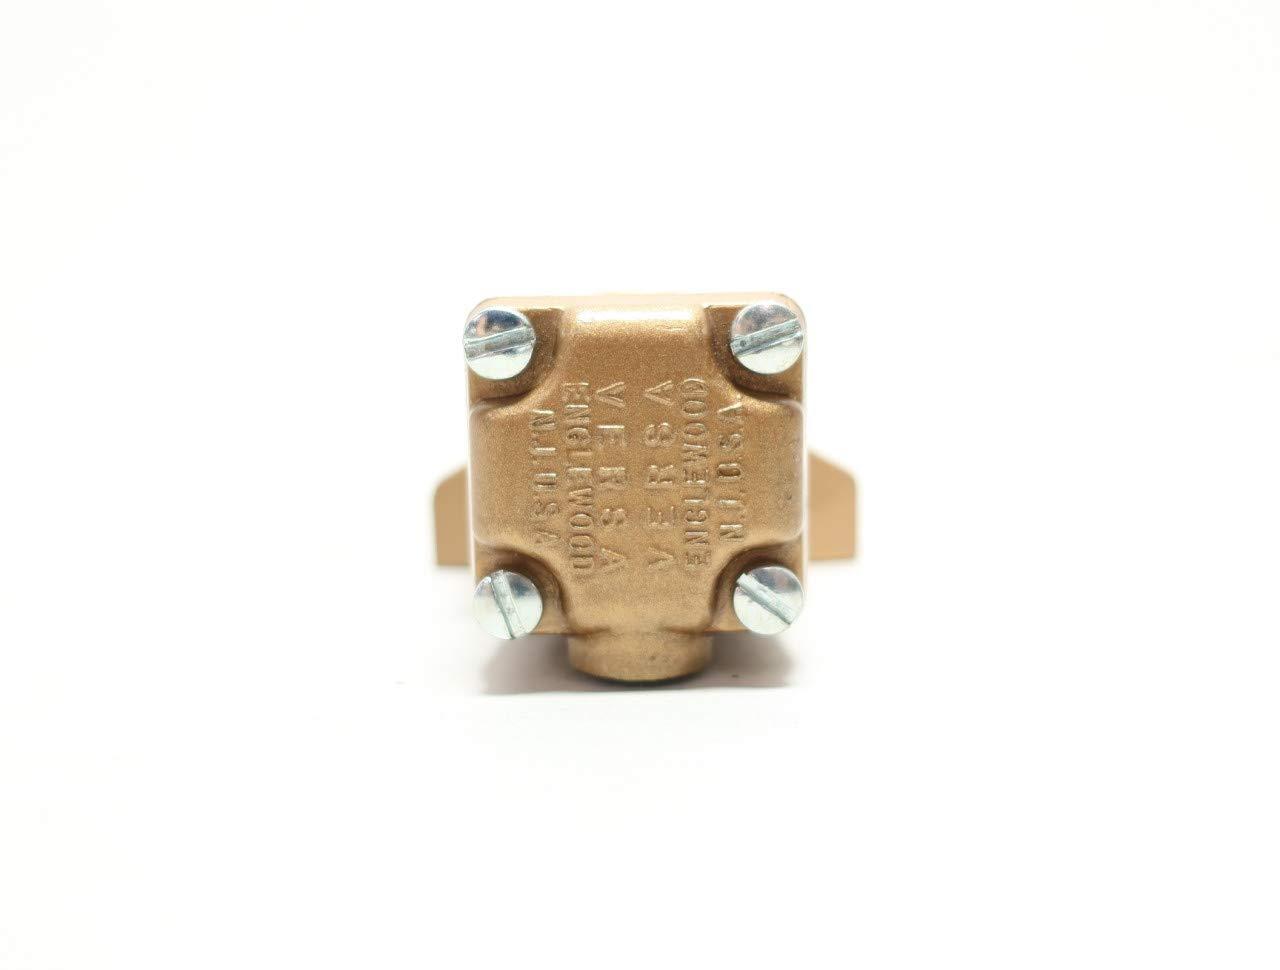 VERSA VPP-4532-DD-MM-1-15-31 MECHANICALLY Operated Directional Control Valve